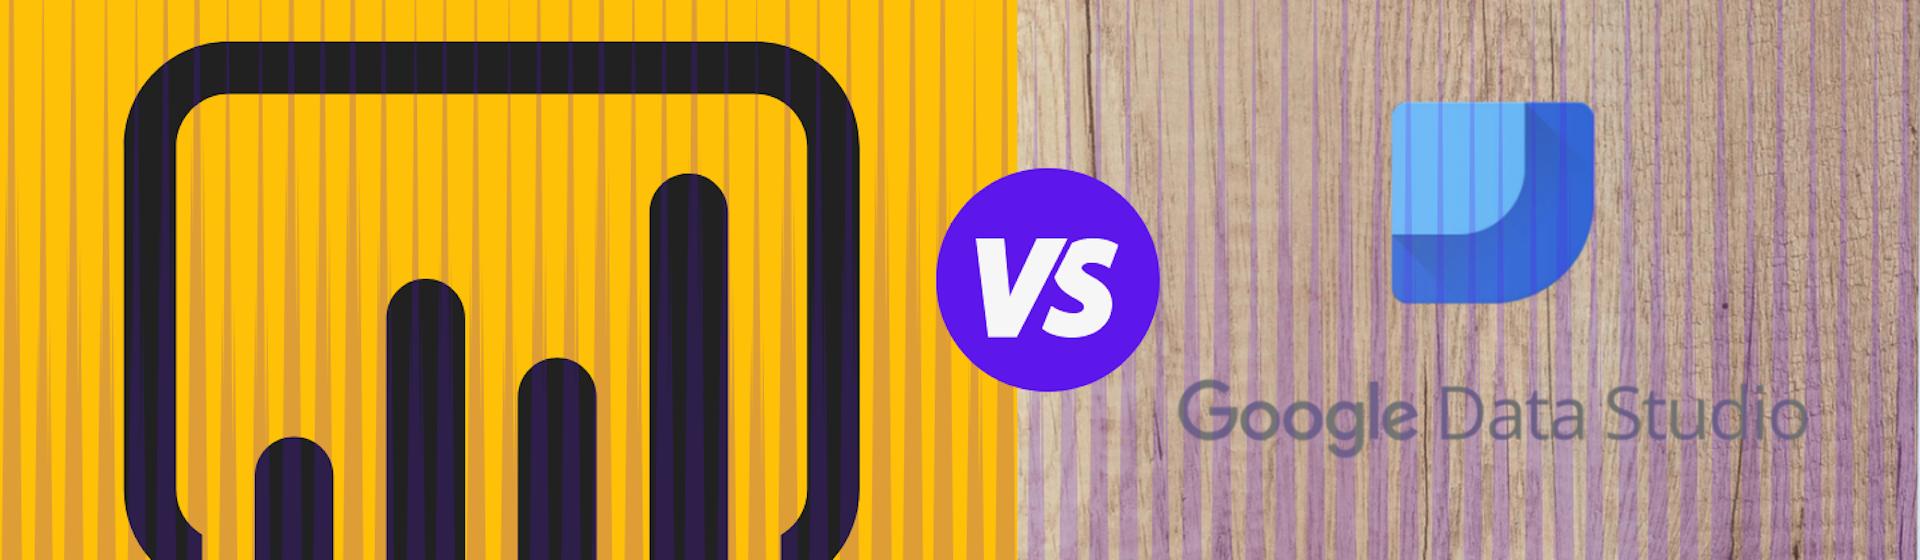 Google Data Studio vs Power BI: Conoce el poder estas herramientas de BI